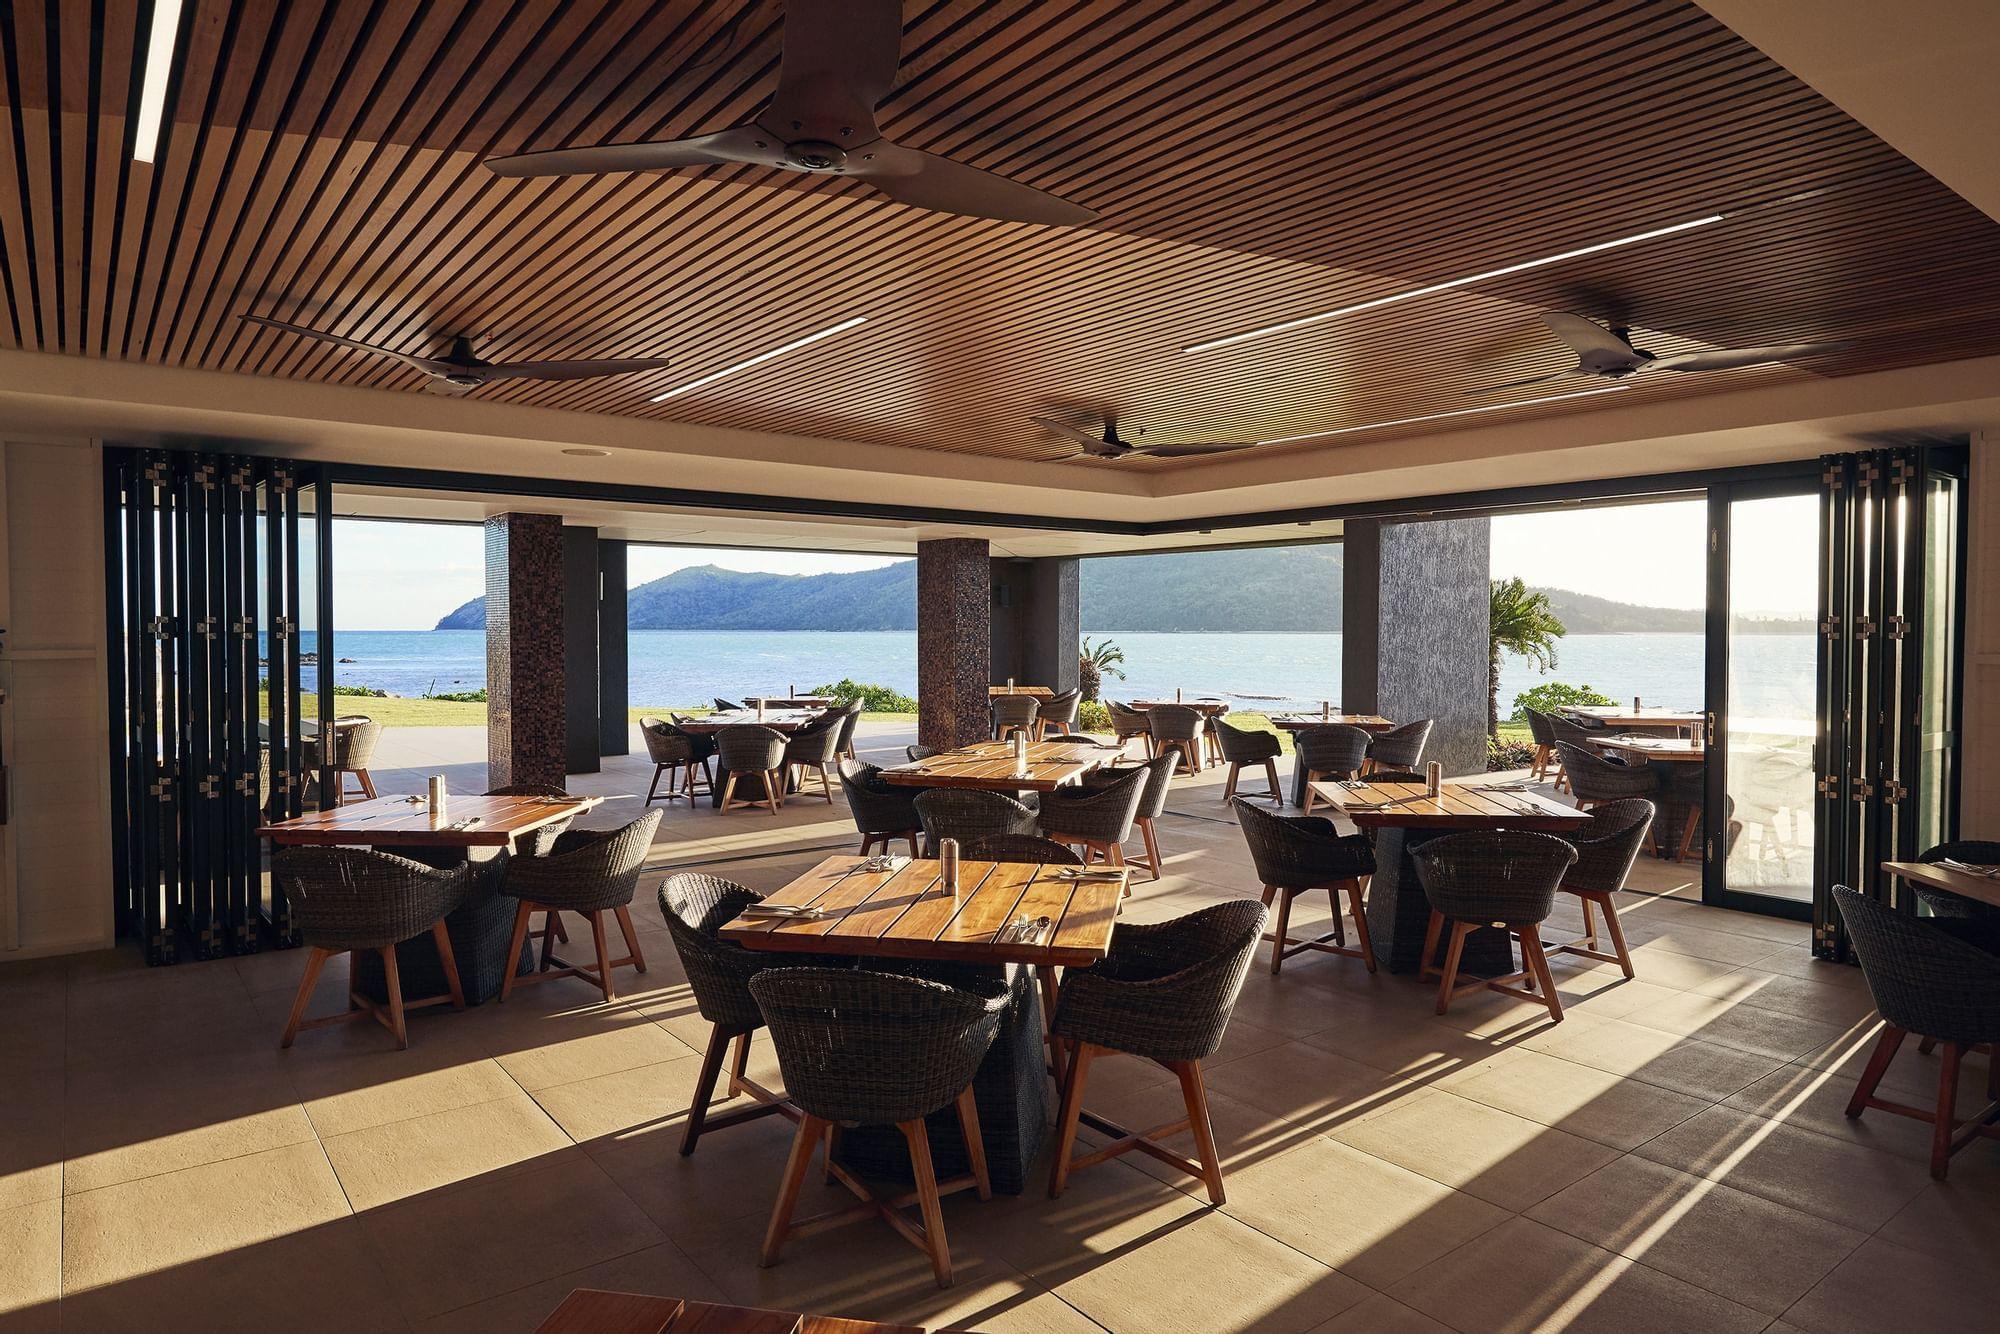 Inkstone Kitchen & Bar with sea view at Daydream Island Resort